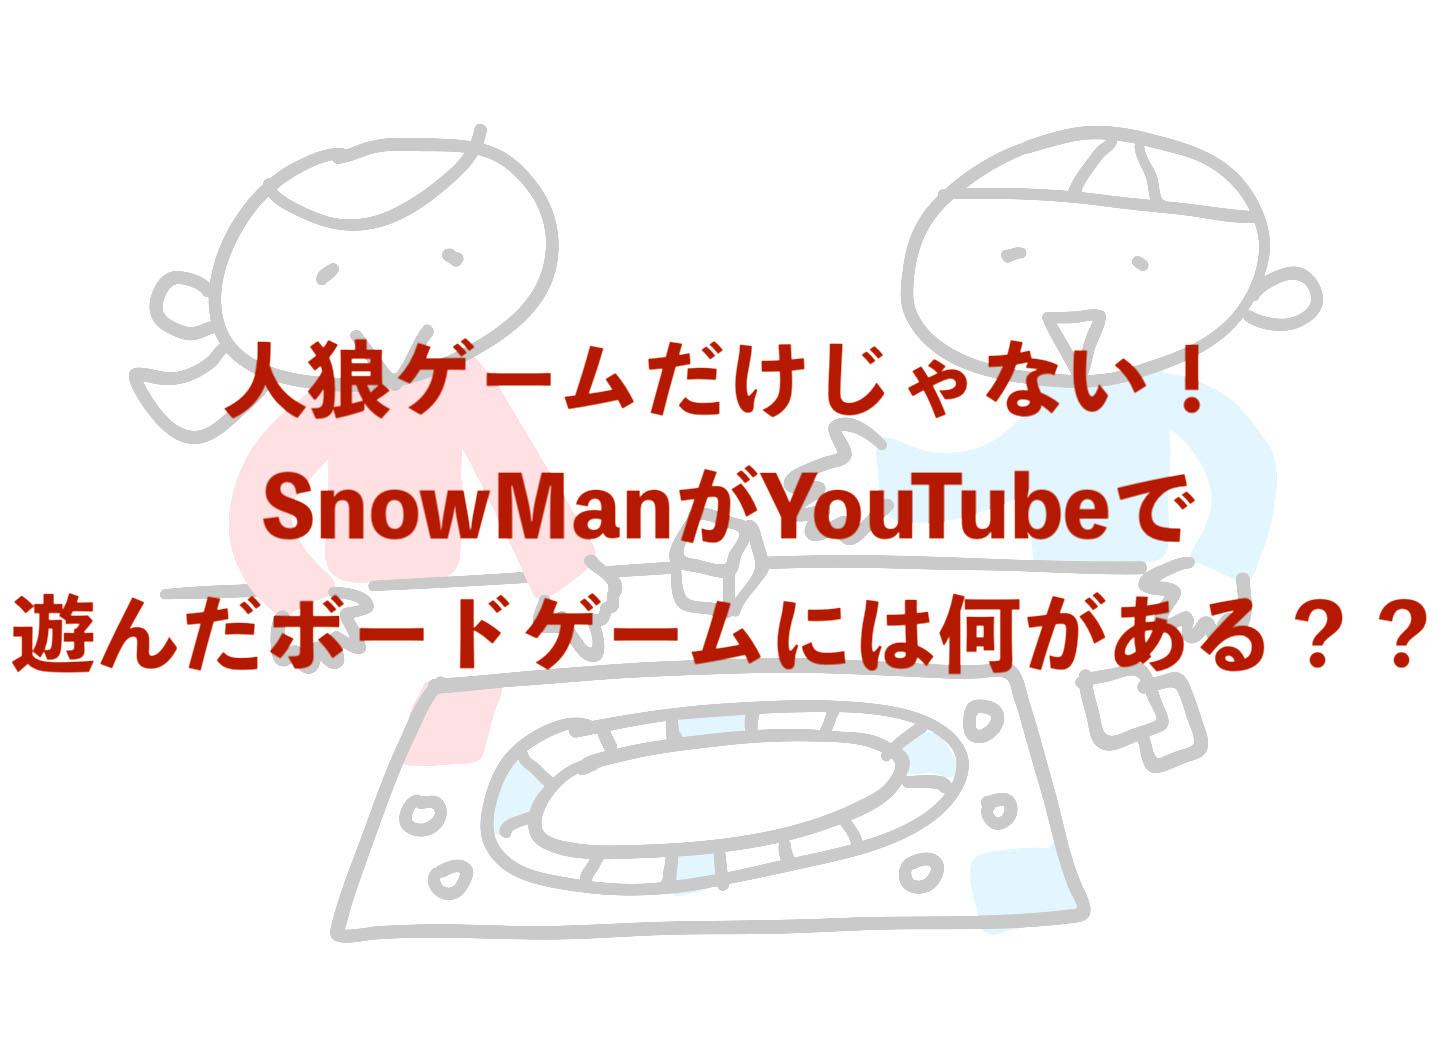 SnowManボードゲーム